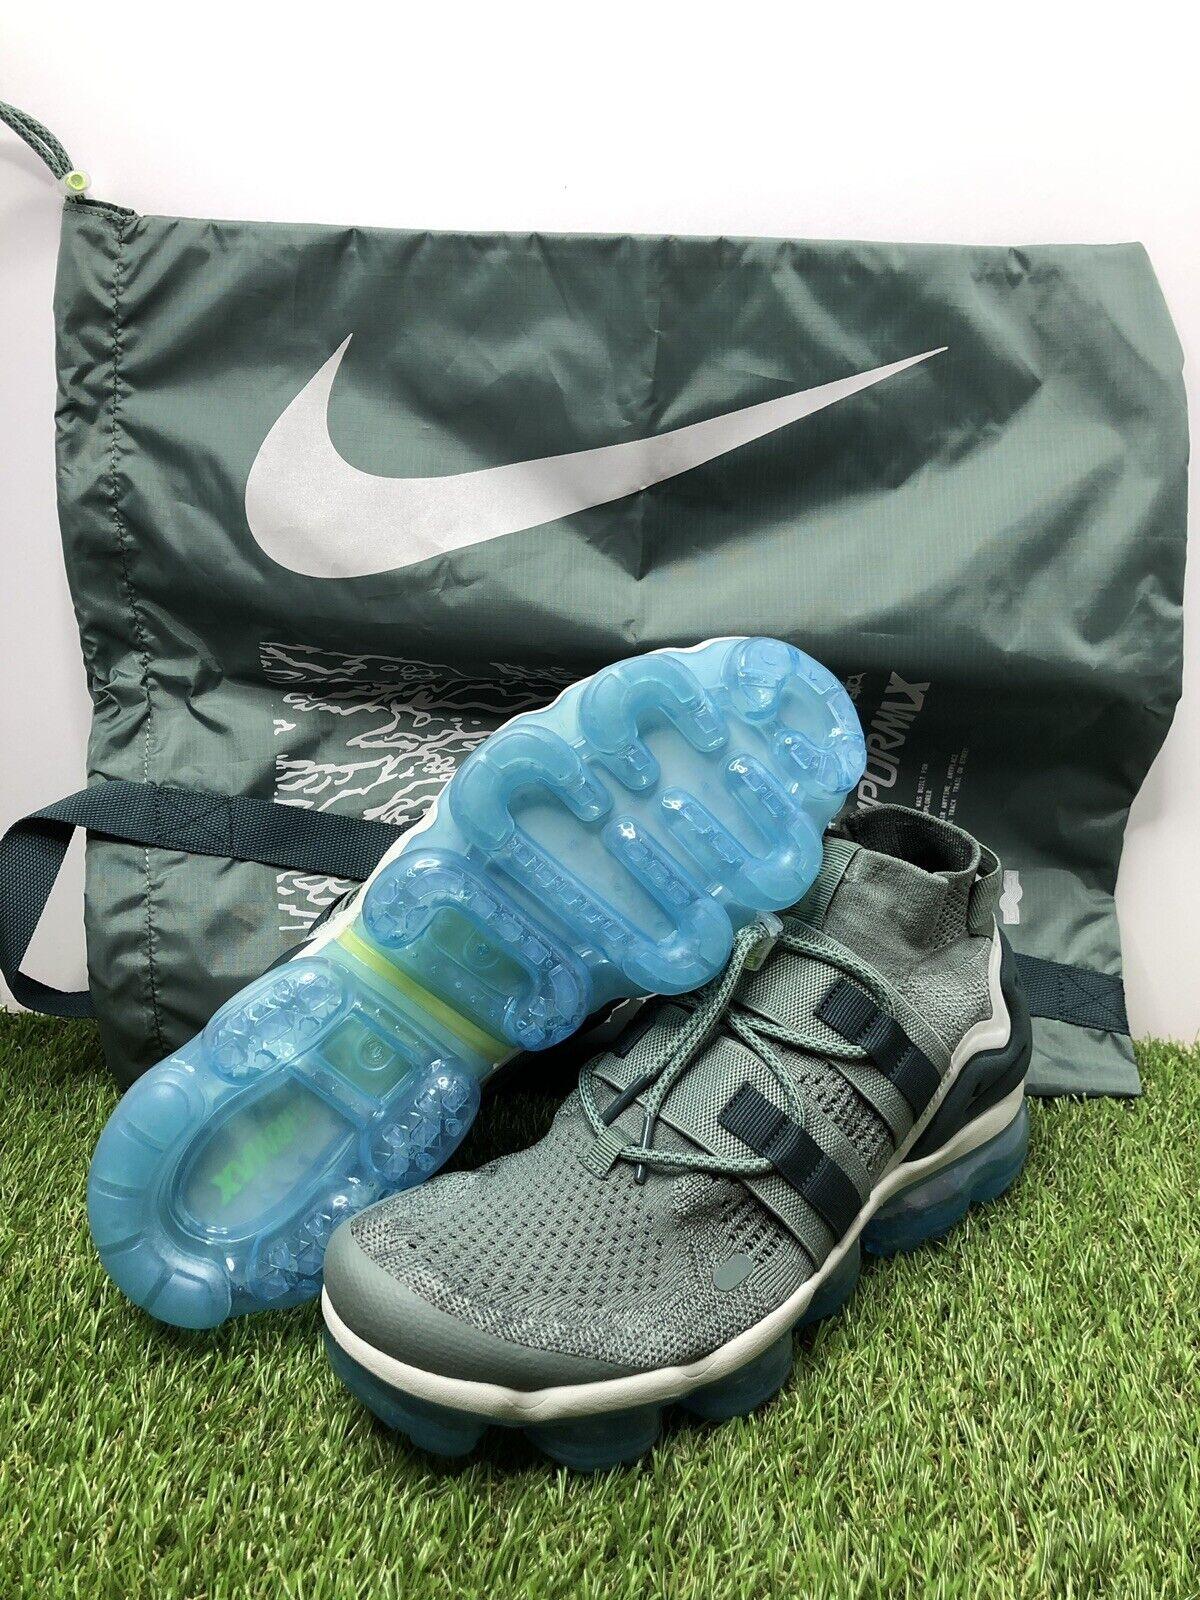 56cff8b3c2f0 NEW Nike Air Vapormax Vapormax Vapormax FK Flyknit Utility Green bluee Size  11.5 AH6834-300